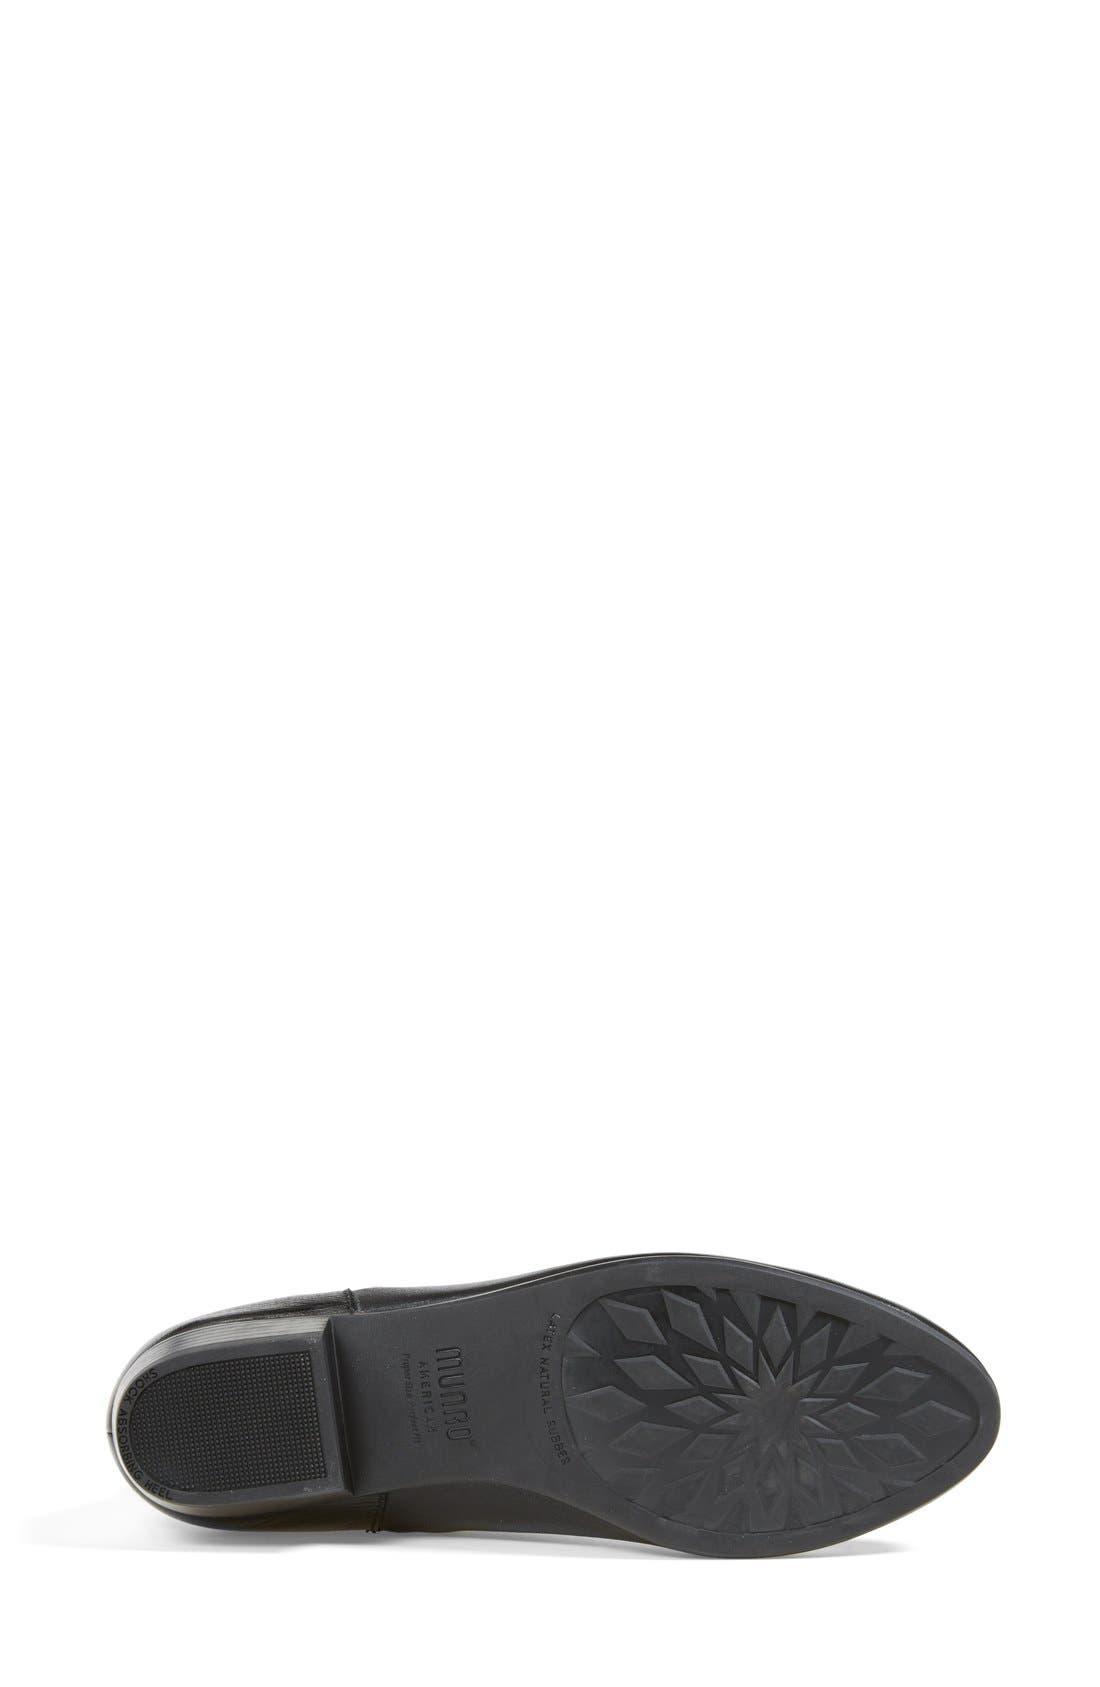 'Lexi' Boot,                             Alternate thumbnail 4, color,                             Black Leather